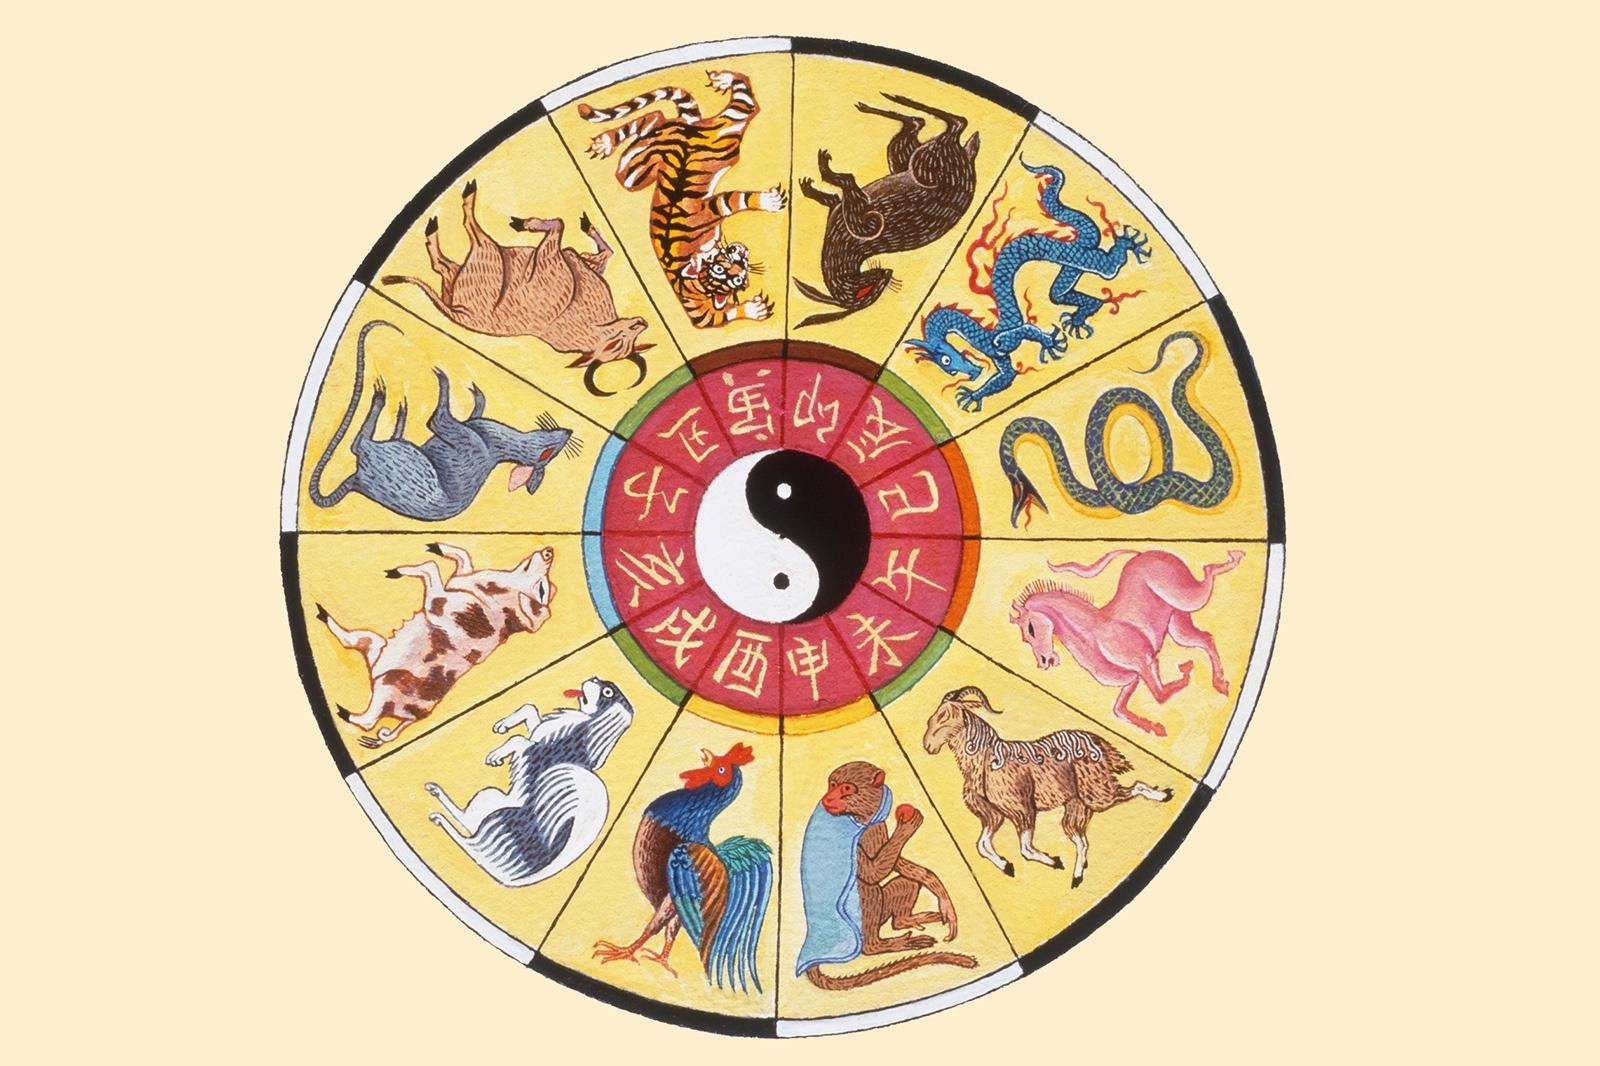 Chinese New Year Zodiac Charts | Lovetoknow Lunar New Year Zodiac Calendar